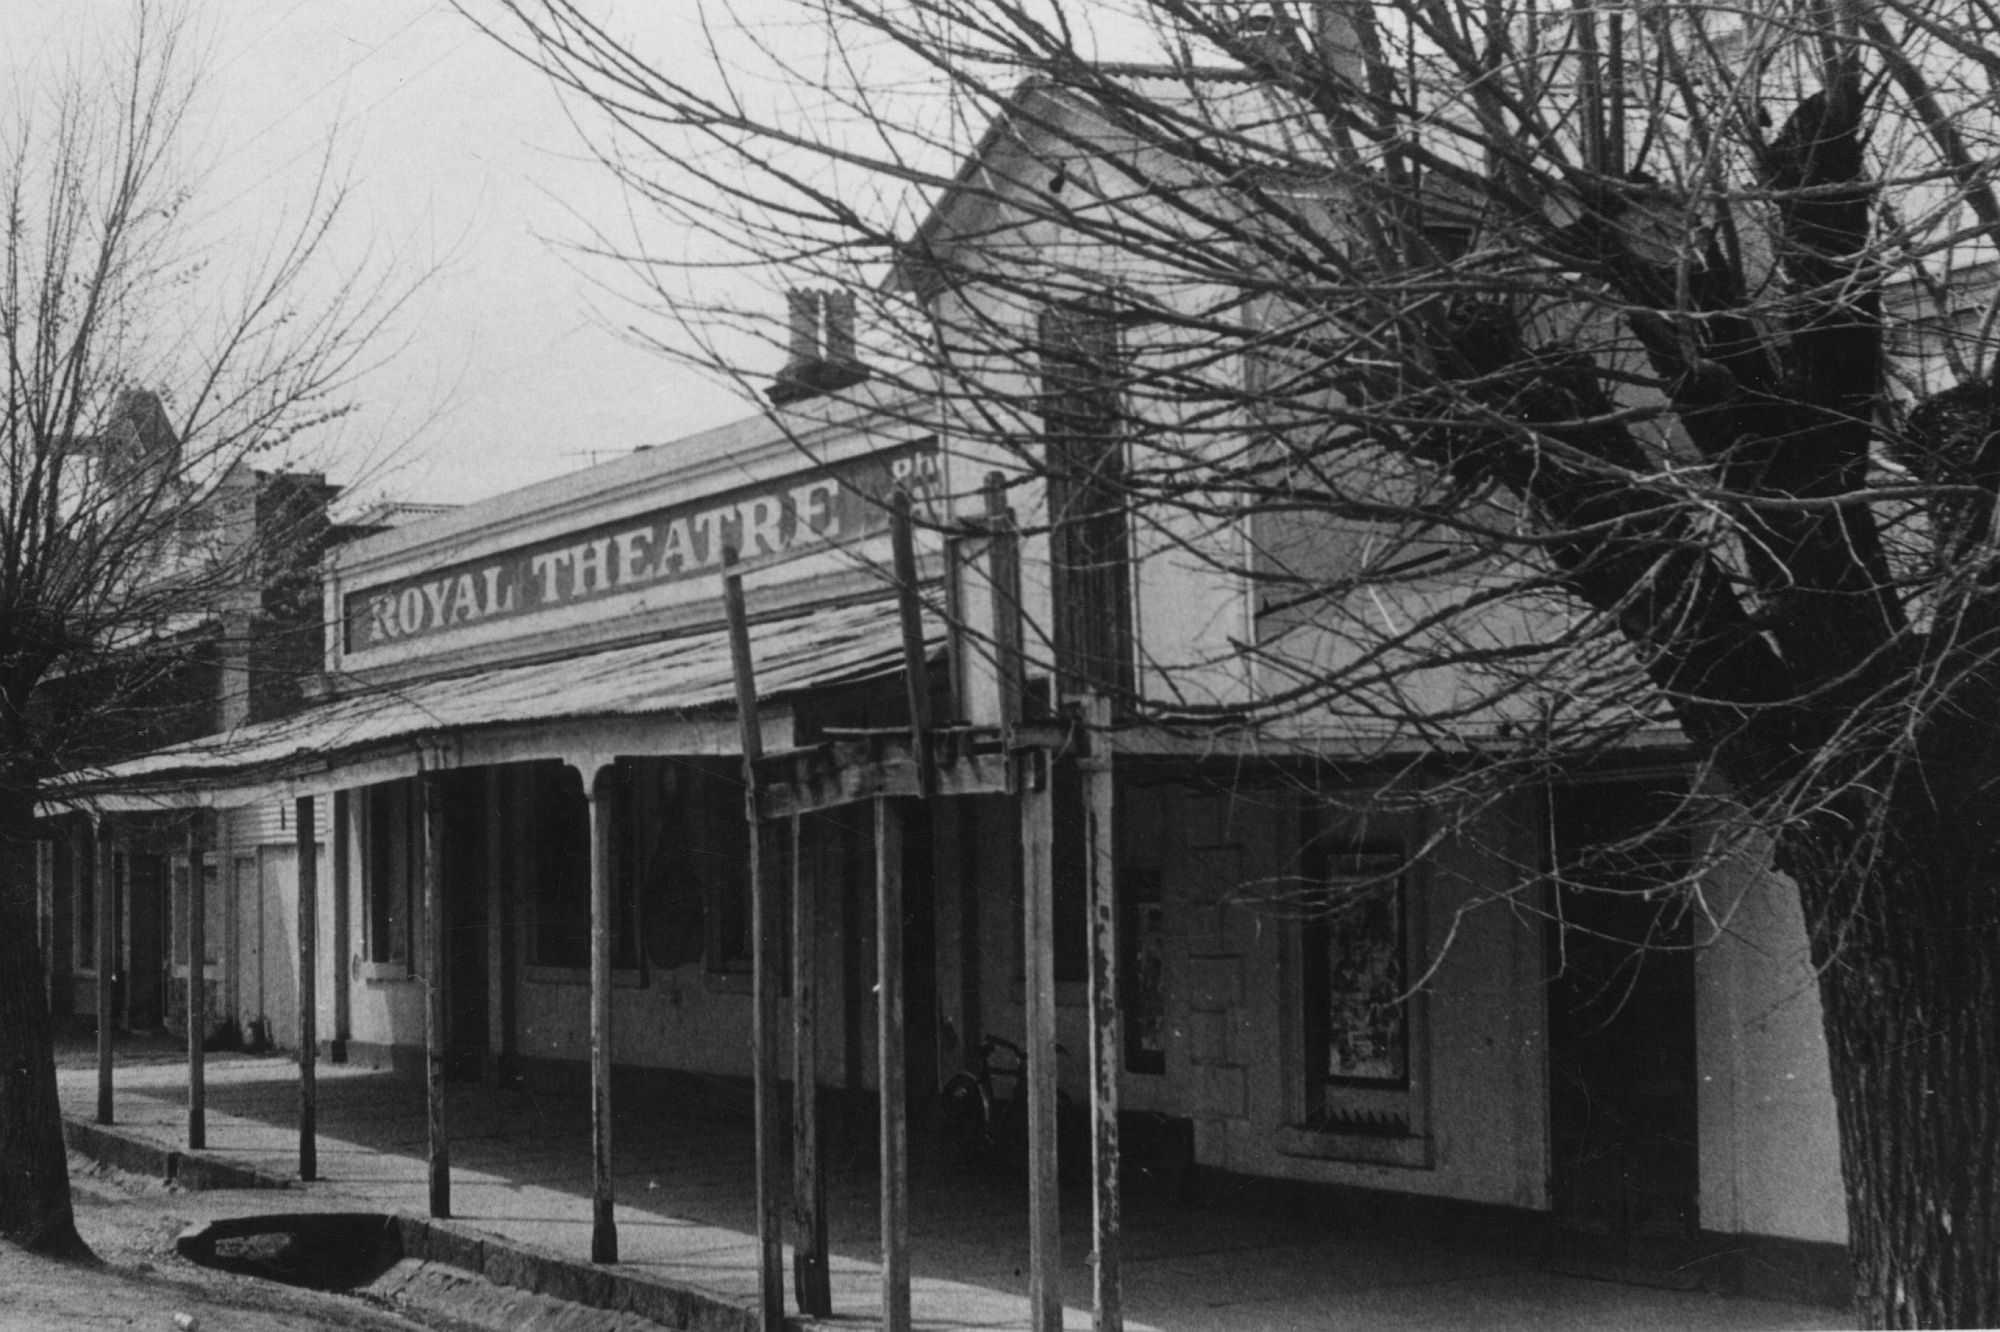 Royal Hotel & Theatre, 1862 & 1857